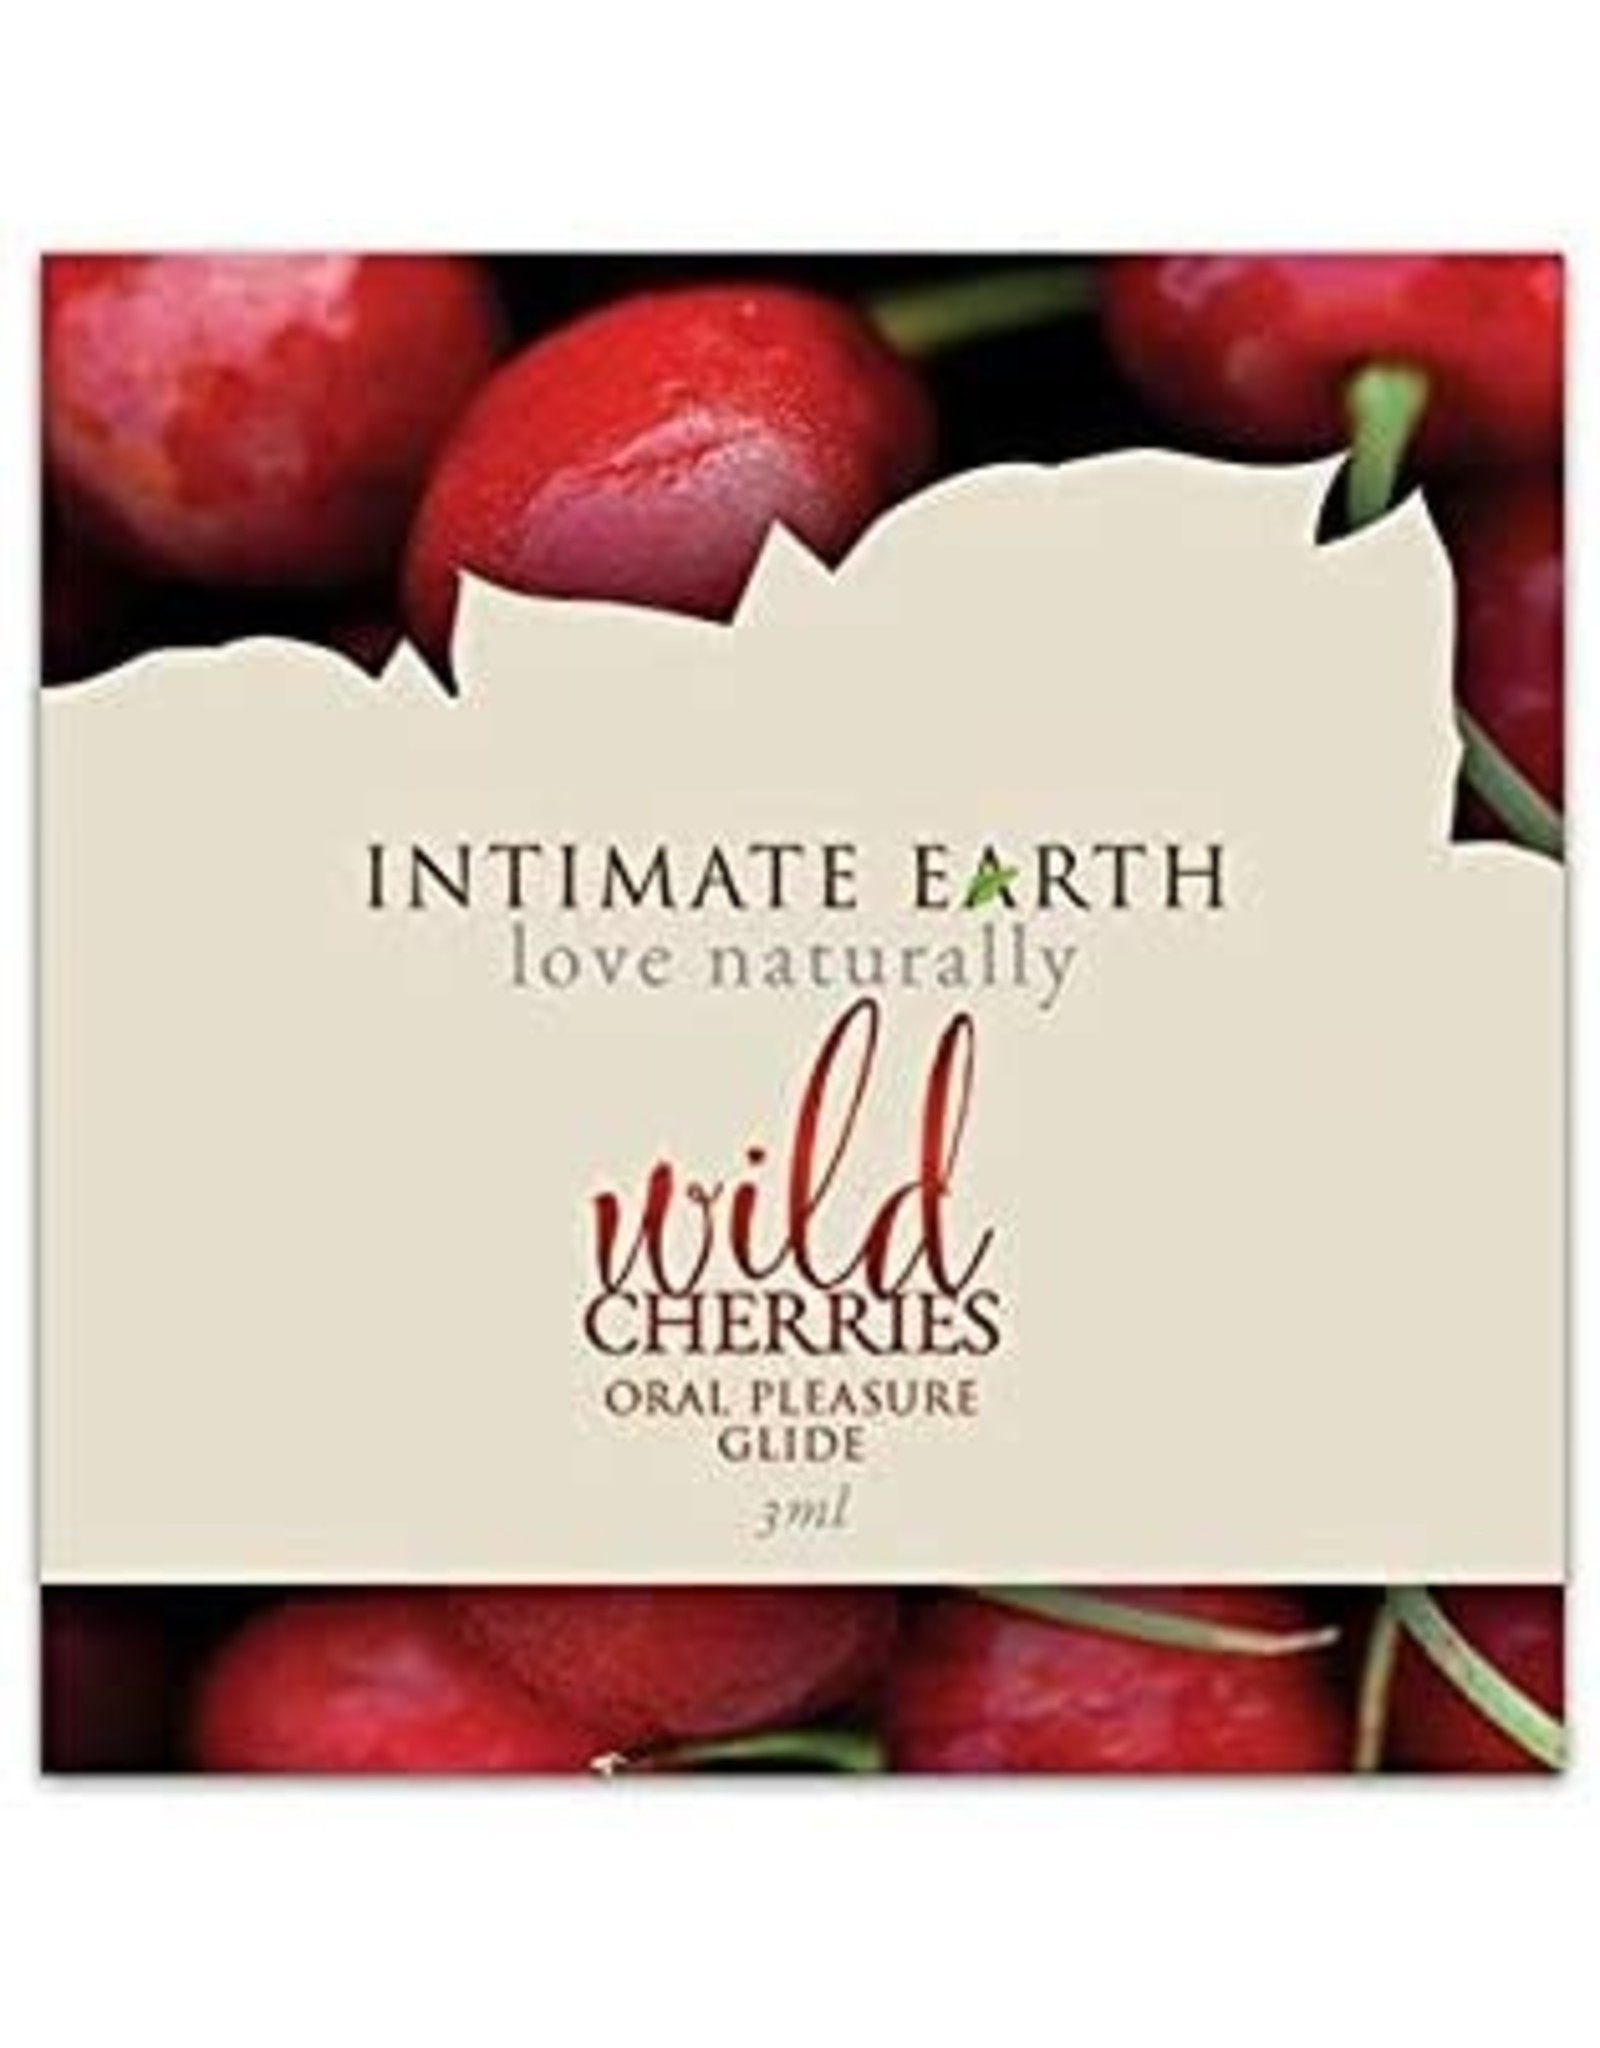 Intimate Earth Wild Cherry 3m Foil